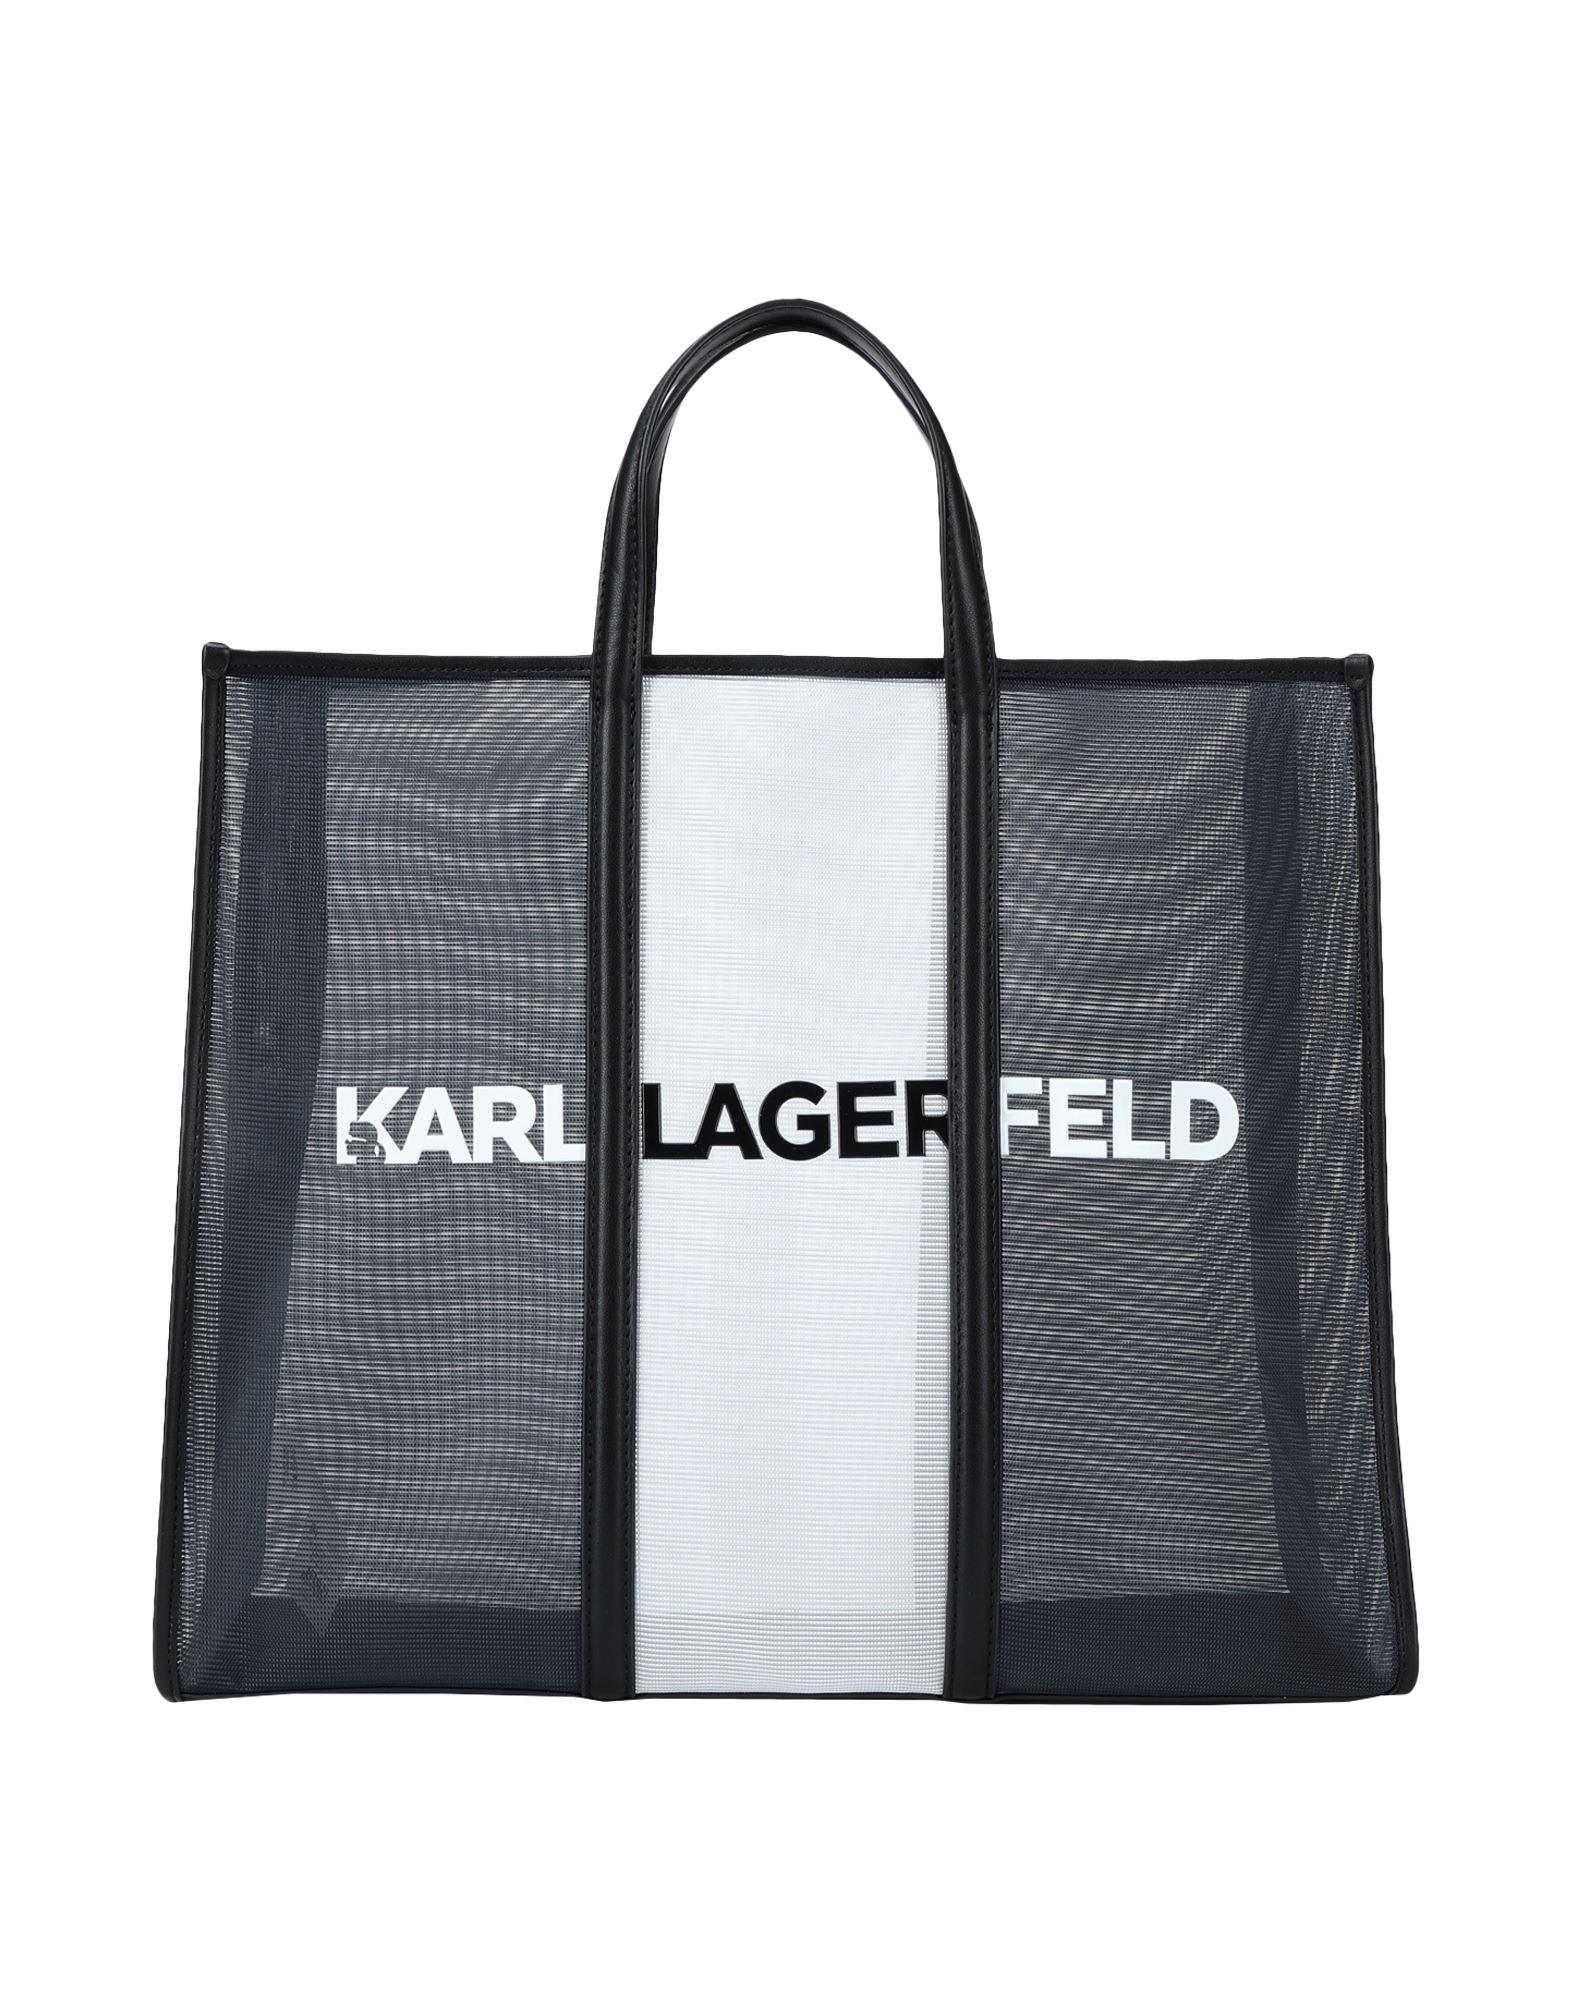 KARL LAGERFELD Handbags - Item 45575416